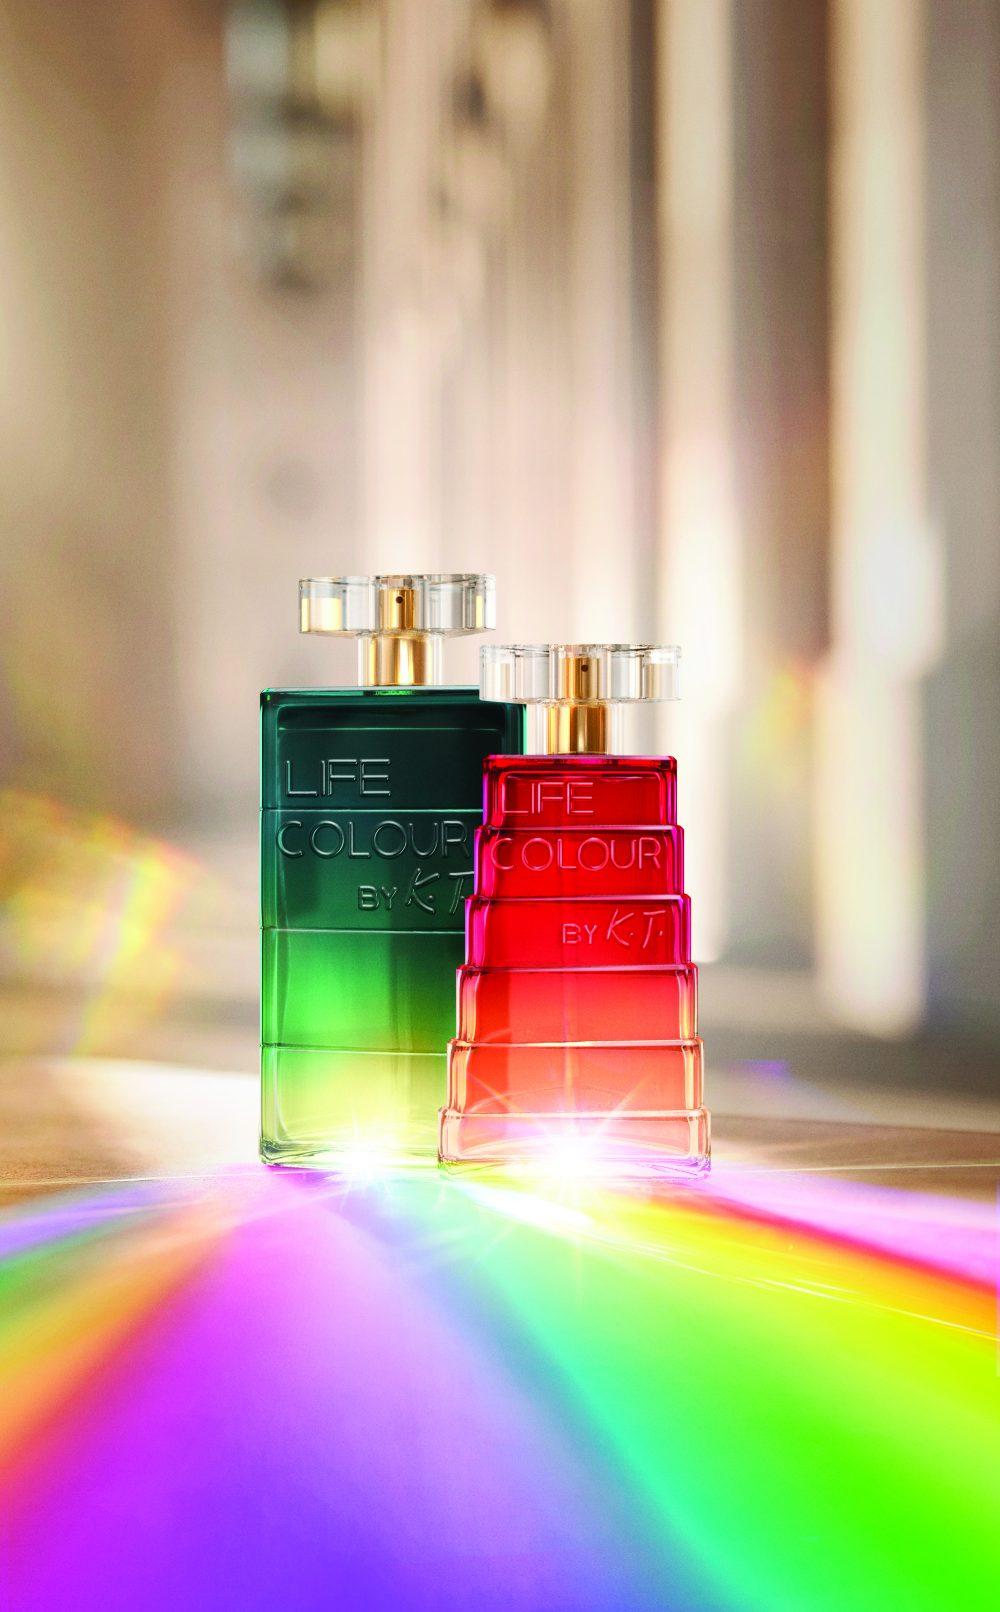 Avon Life Colour fragrances